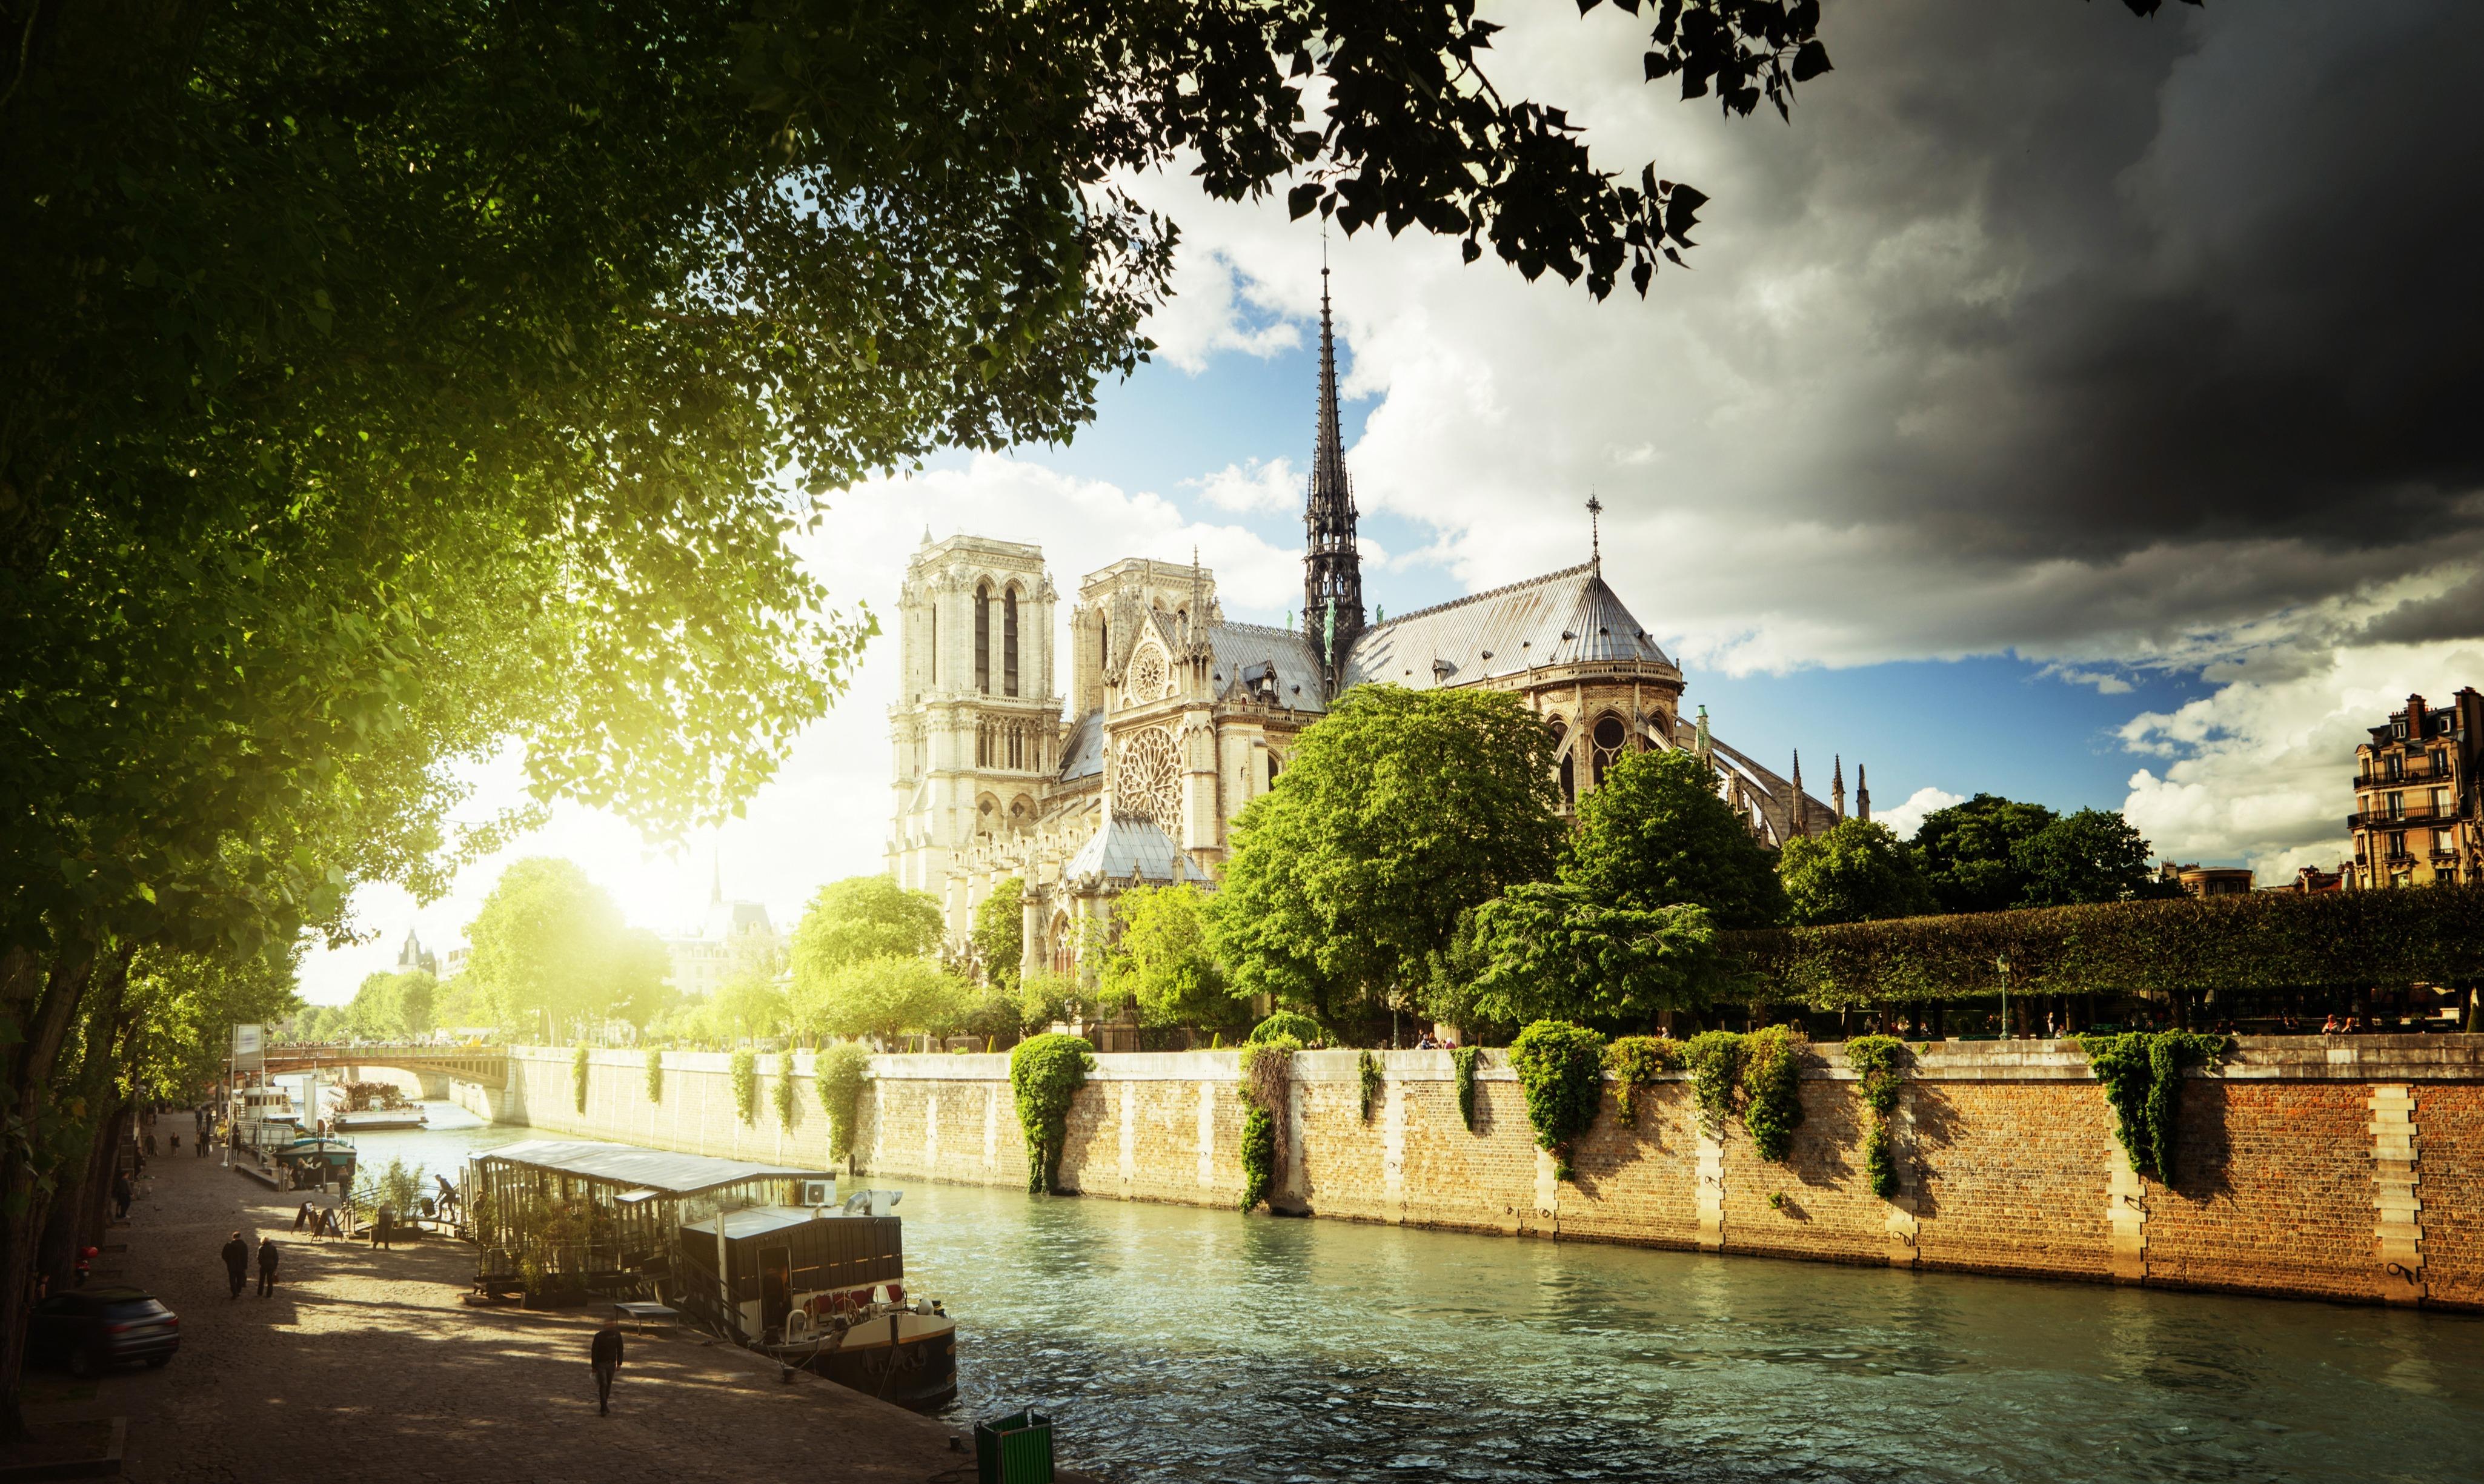 Seine River, France